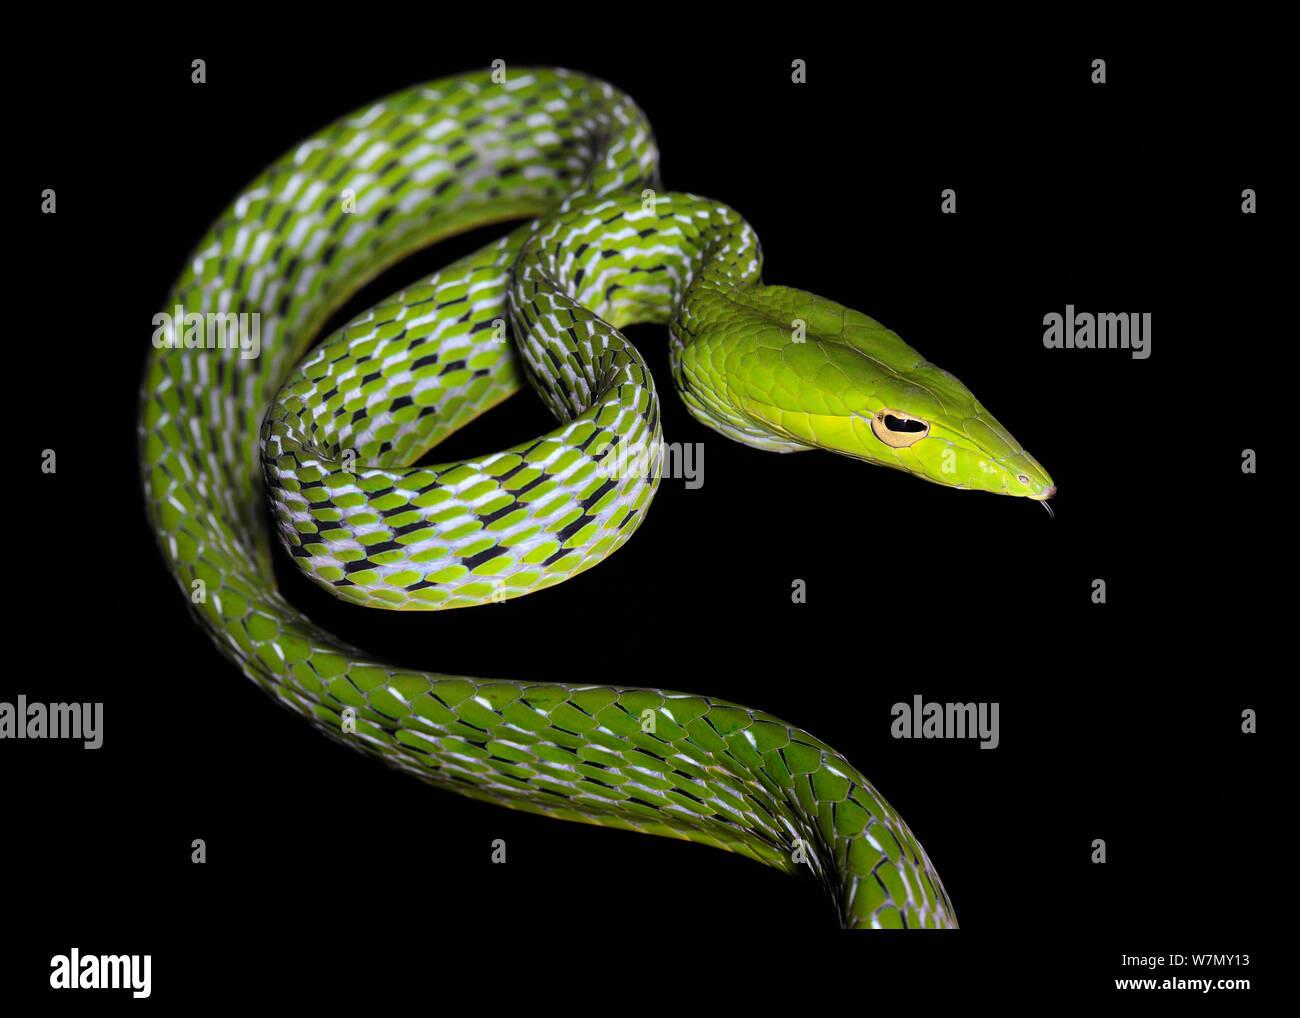 Asian vine / Oriental whip snake (Ahaetulla prasina) captive, from Asia Stock Photo